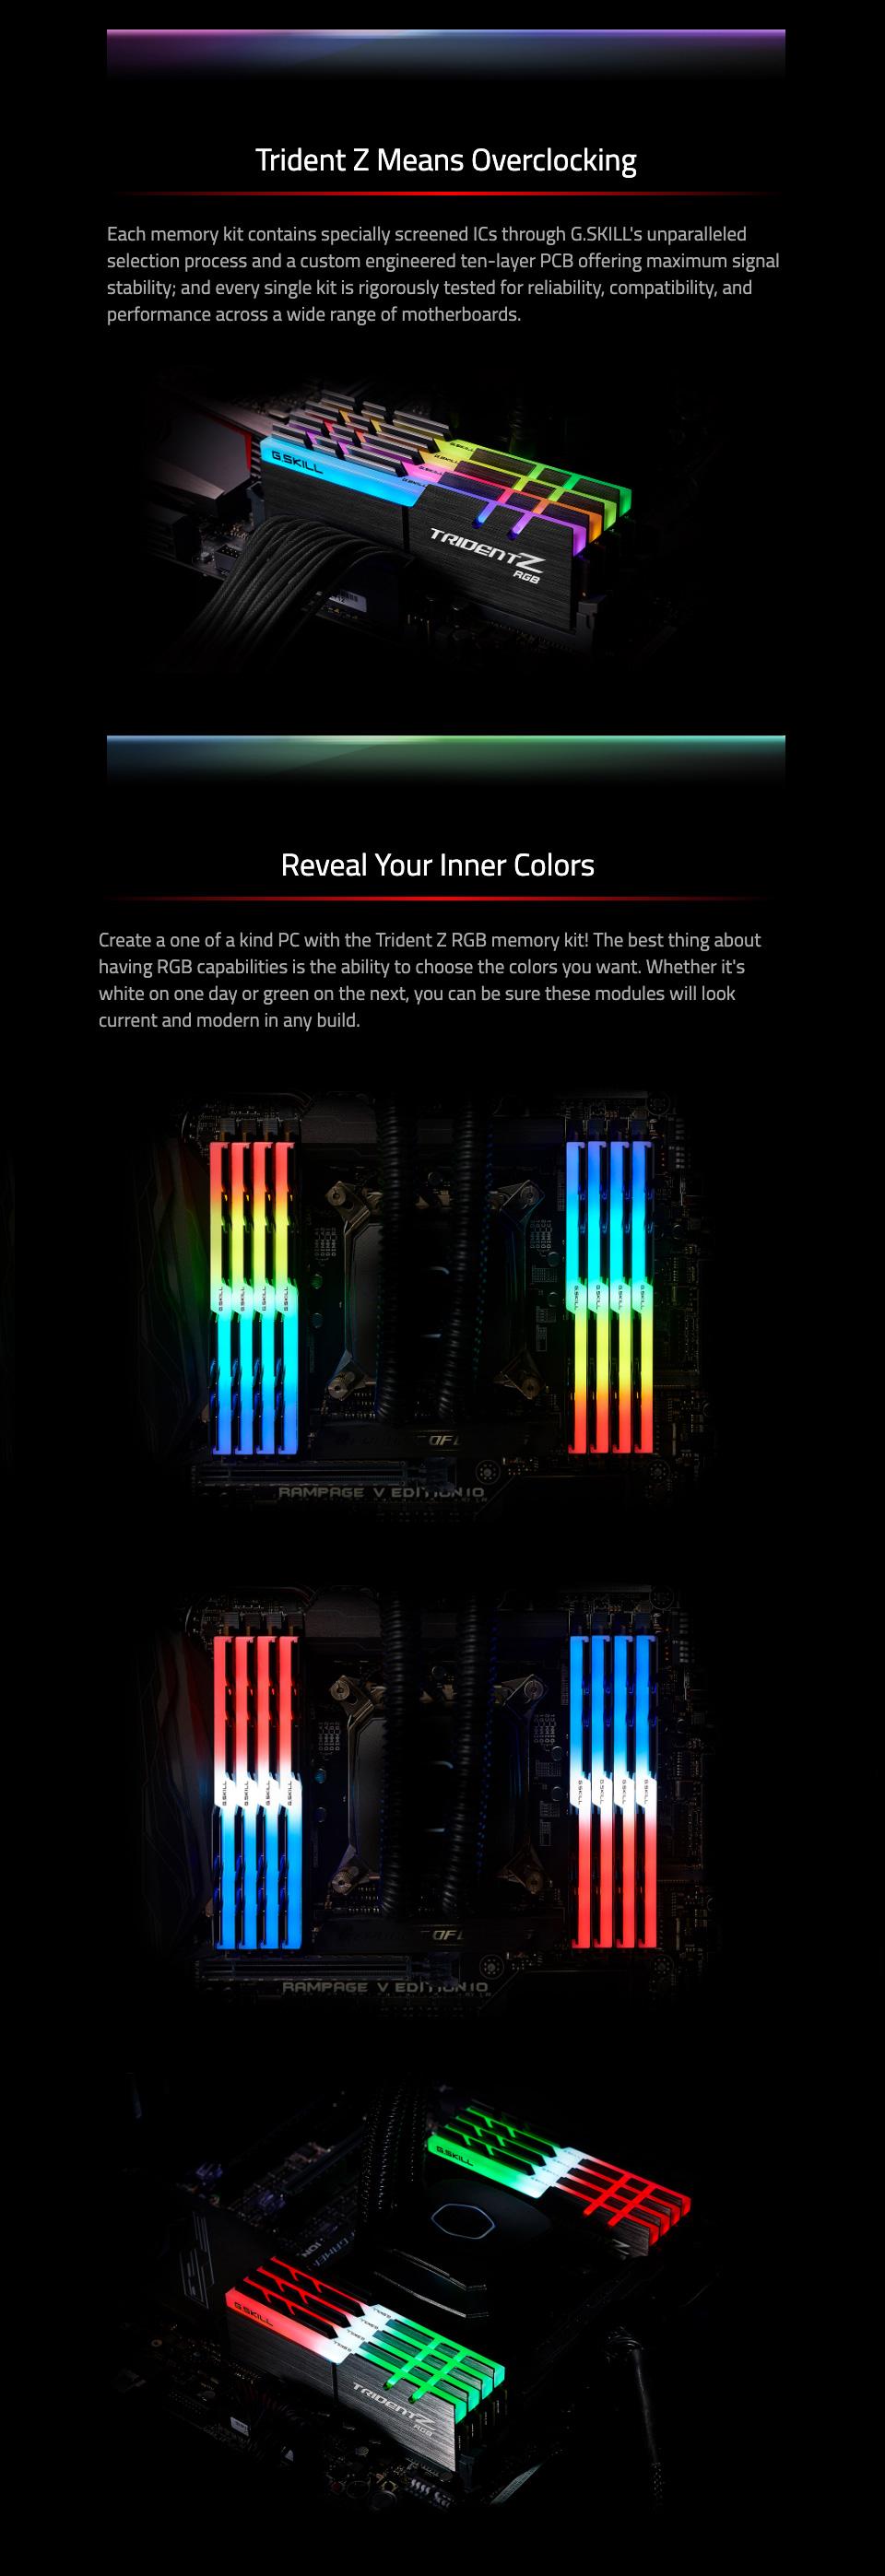 G.Skill Trident Z RGB F4-3600C16Q-64GTZR 64GB (4x16GB) DDR4 features 2